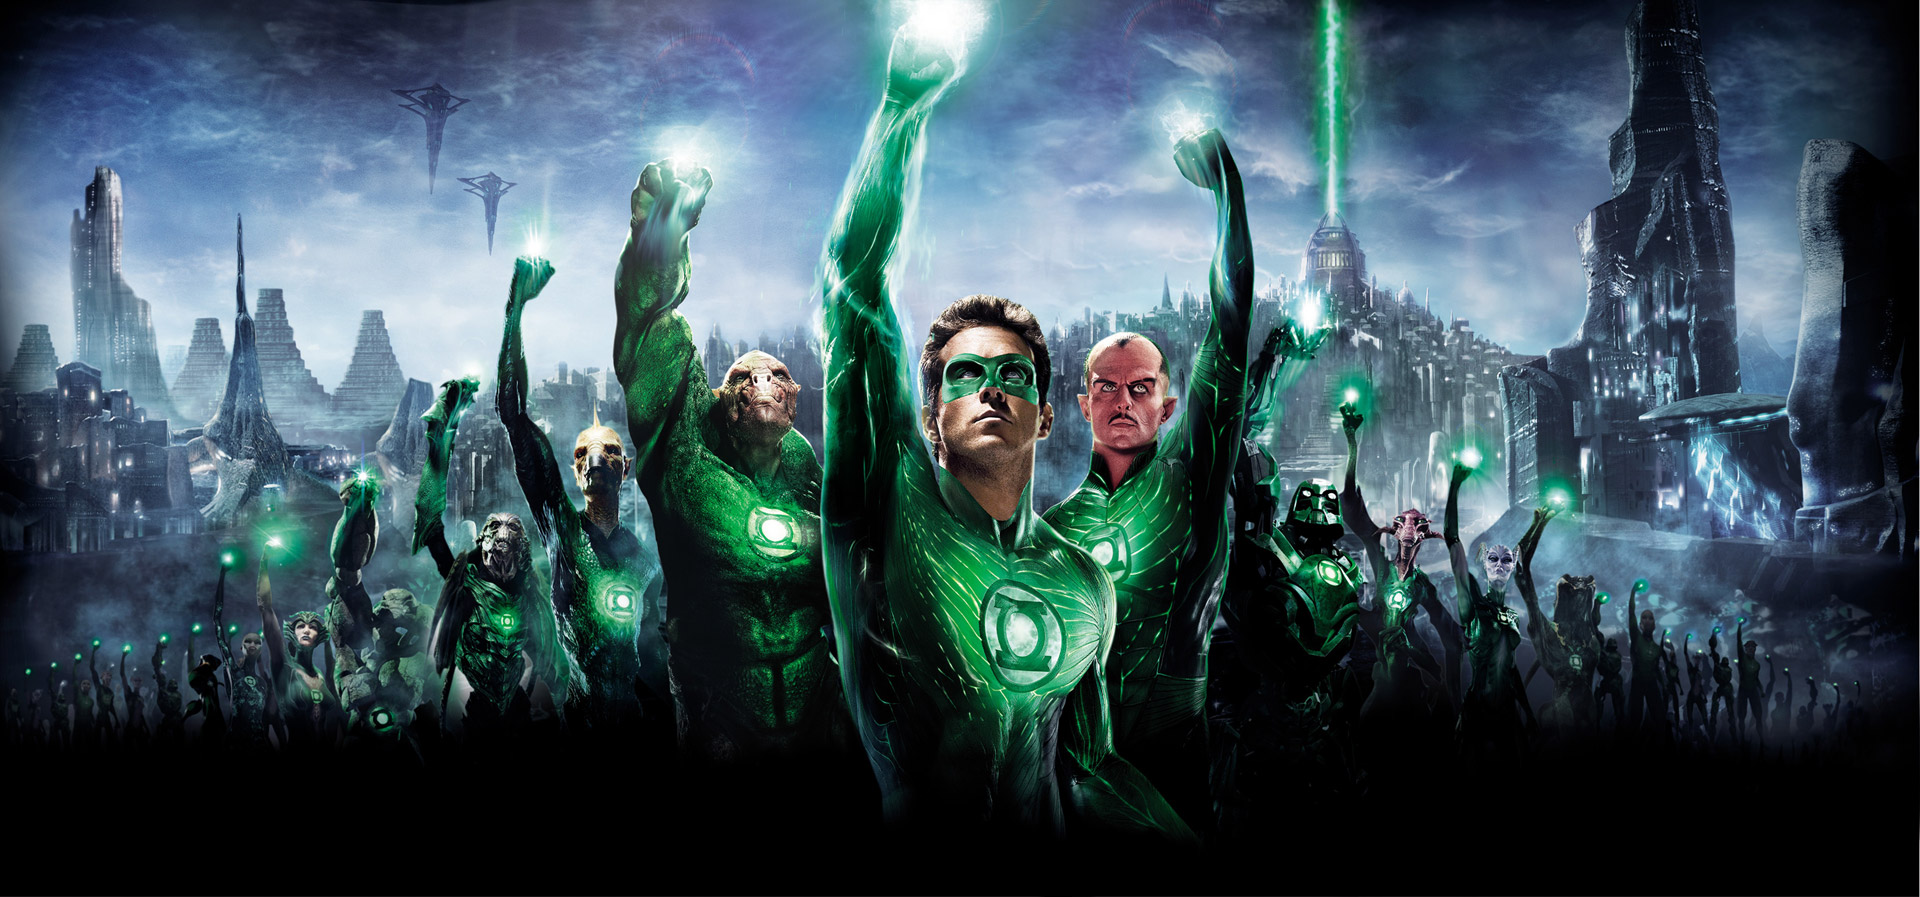 http://collider.com/wp-content/uploads/green-lantern-banner-image.jpg